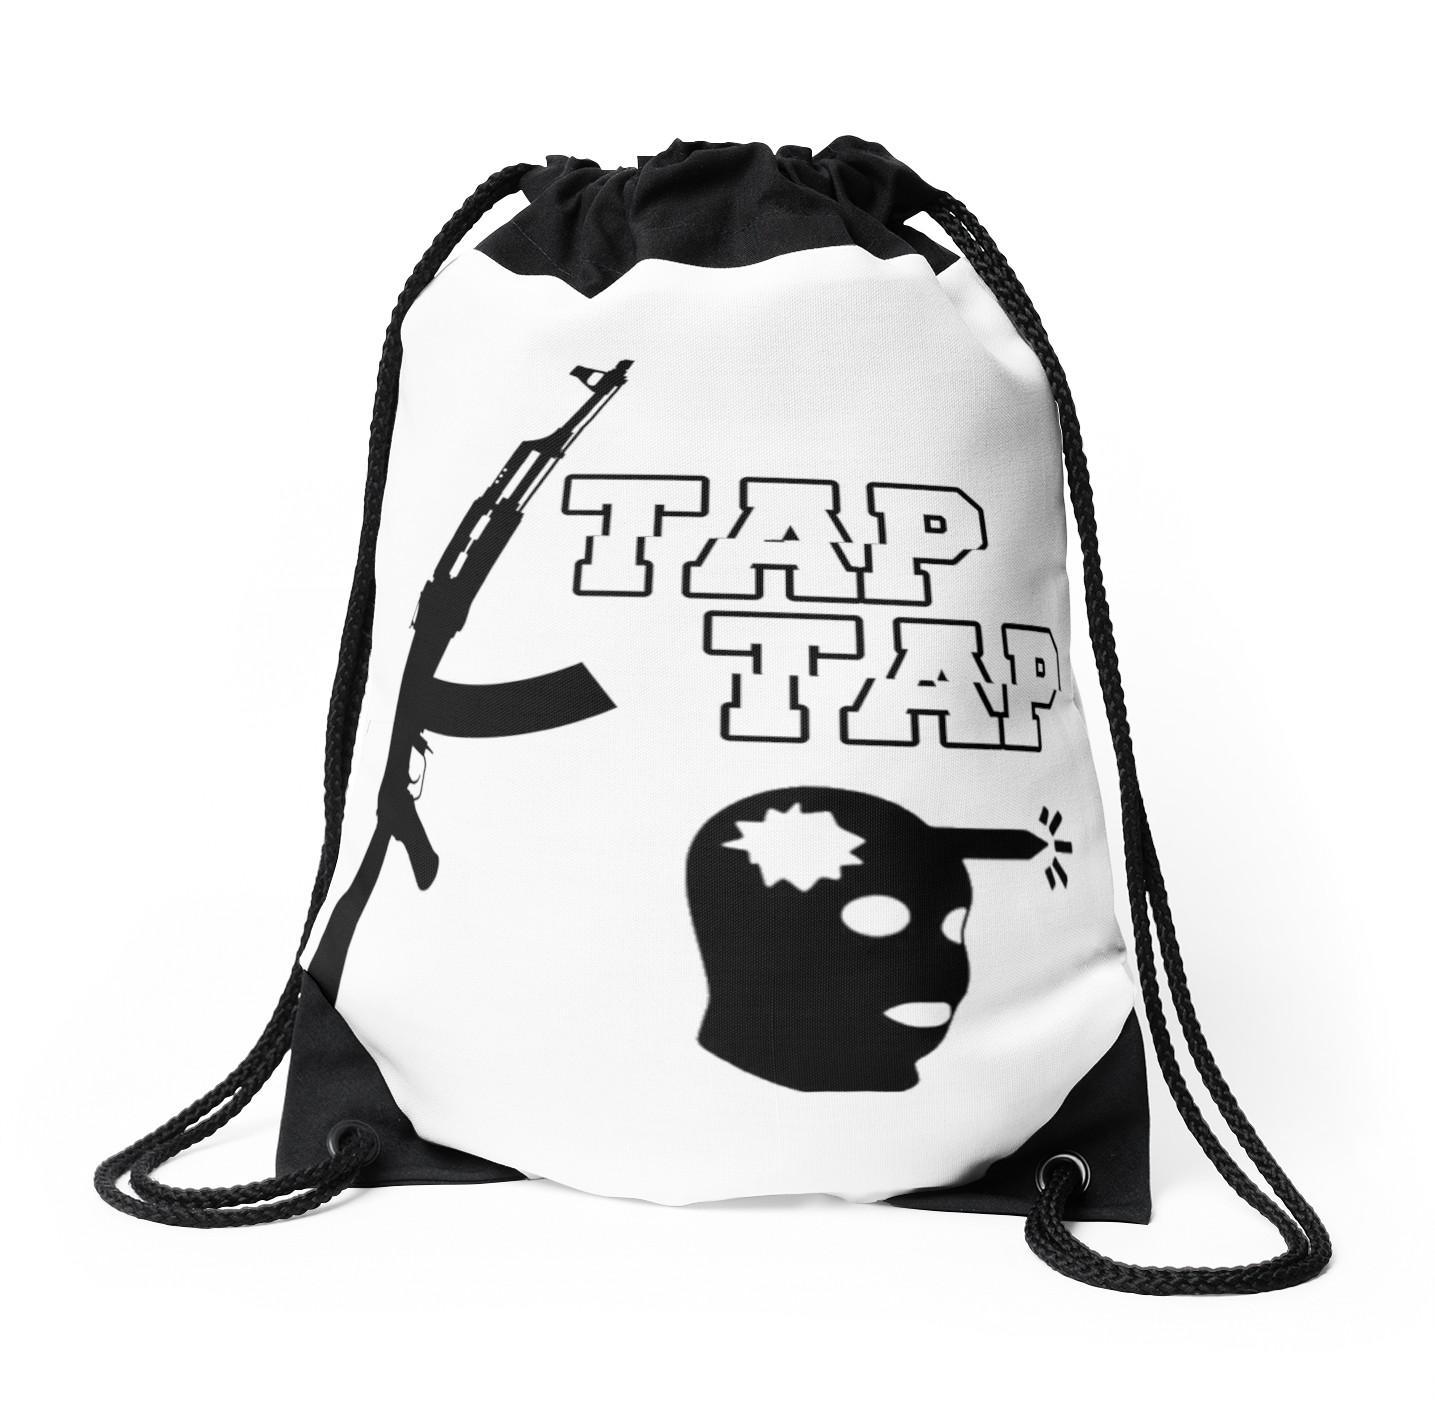 1435x1404 Tap Tap (Csgo) Drawstring Bags By Dibzz Redbubble